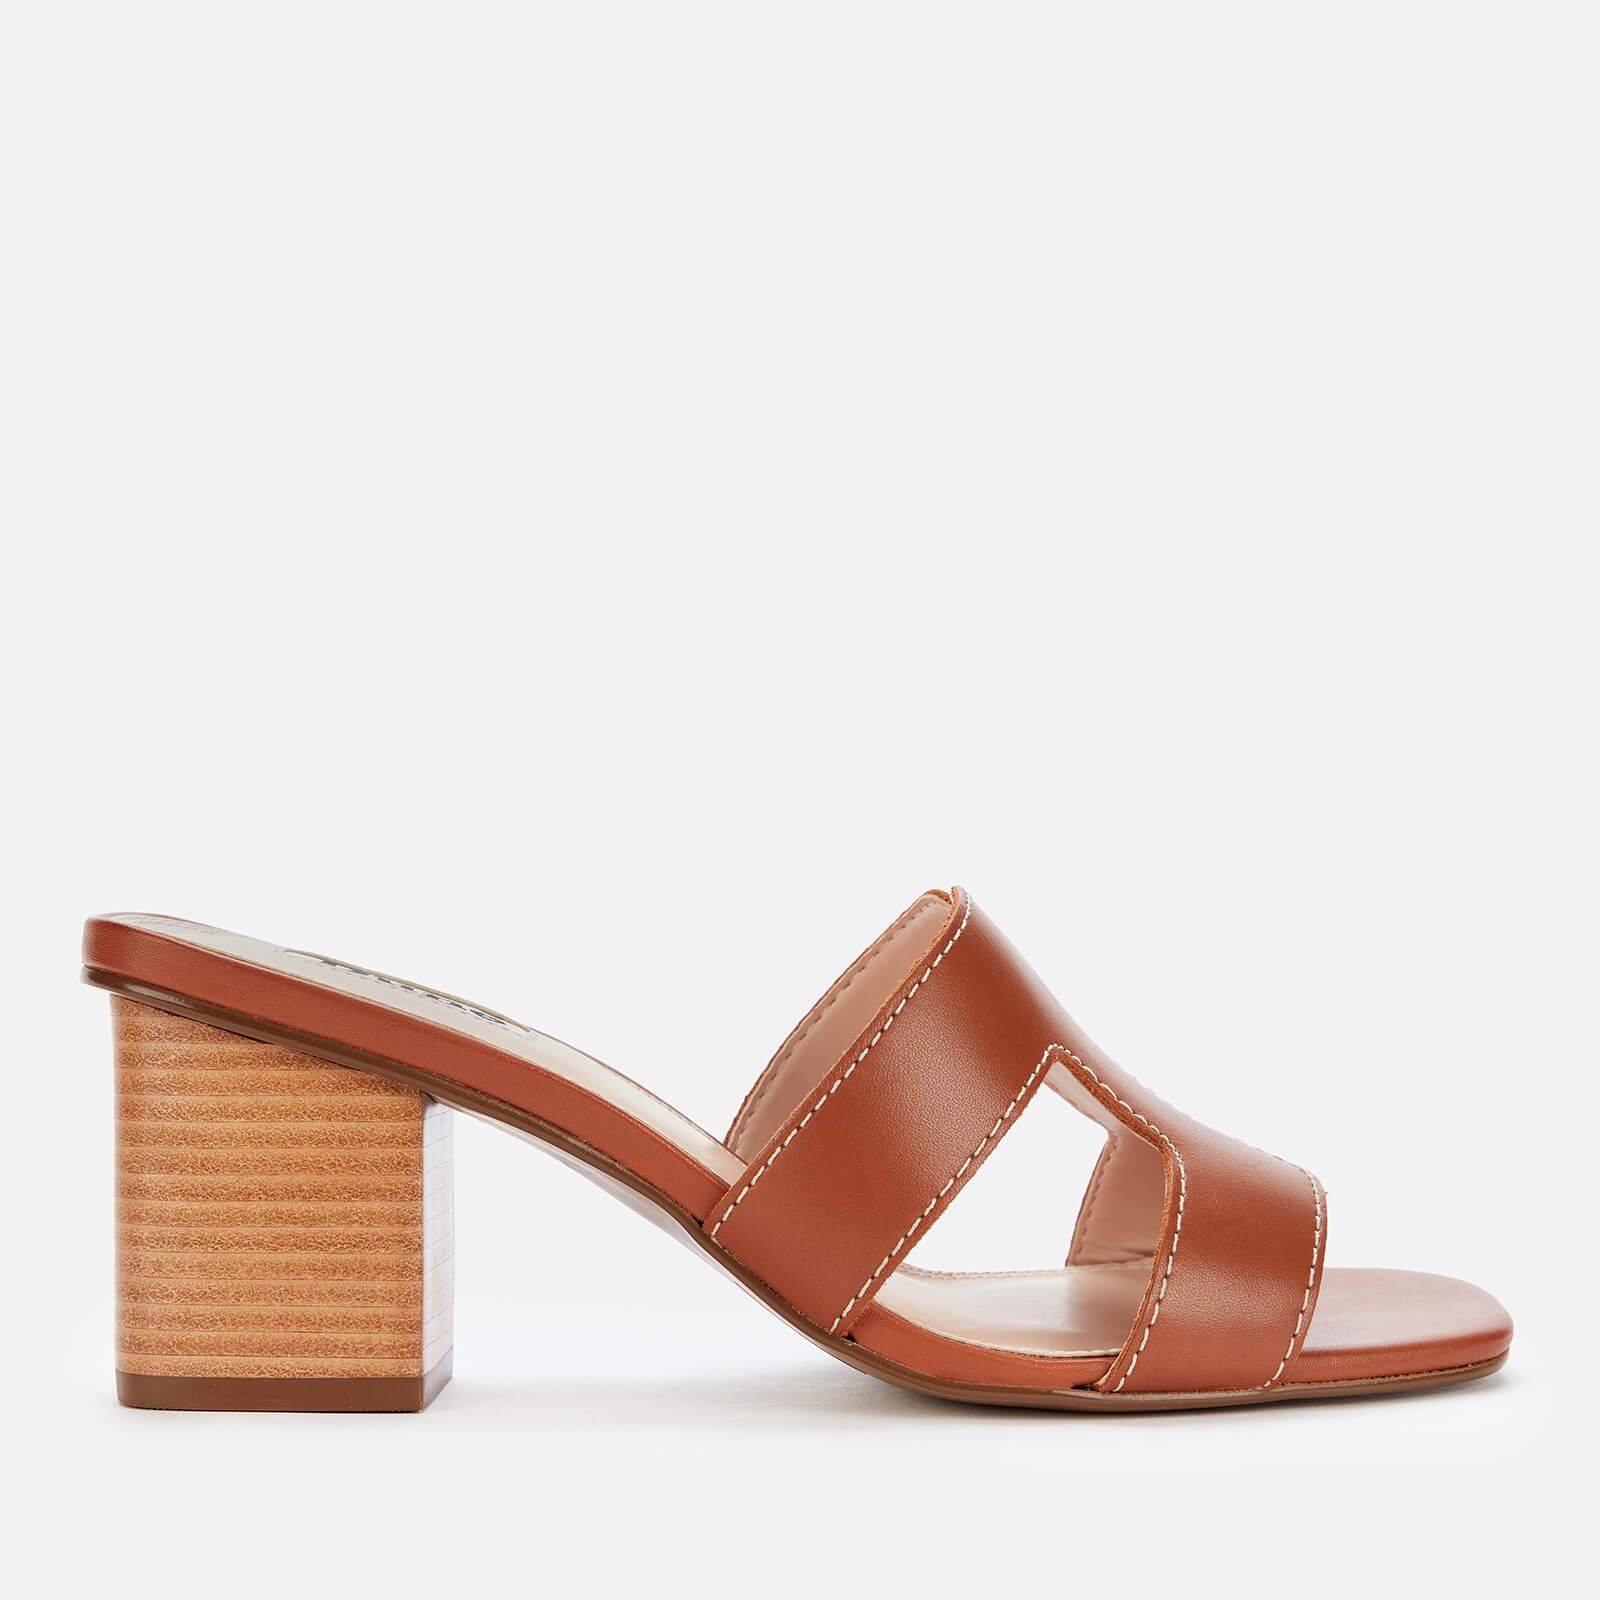 Dune Womens Jupe Leather Heeled Mules Tan Uk 7